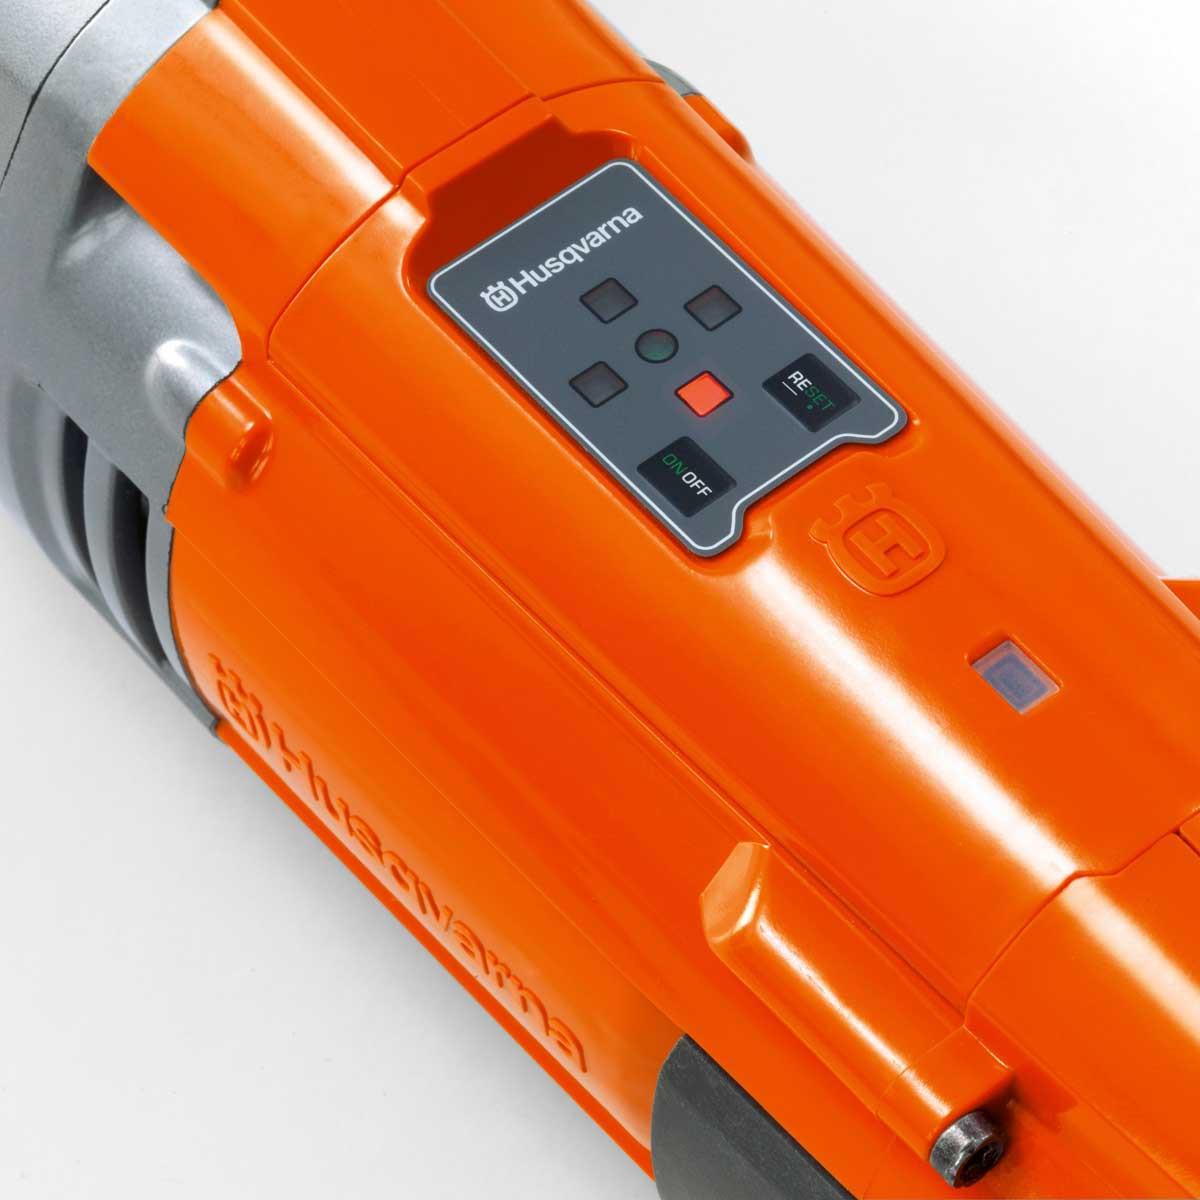 Husqvarna DM220 water hose